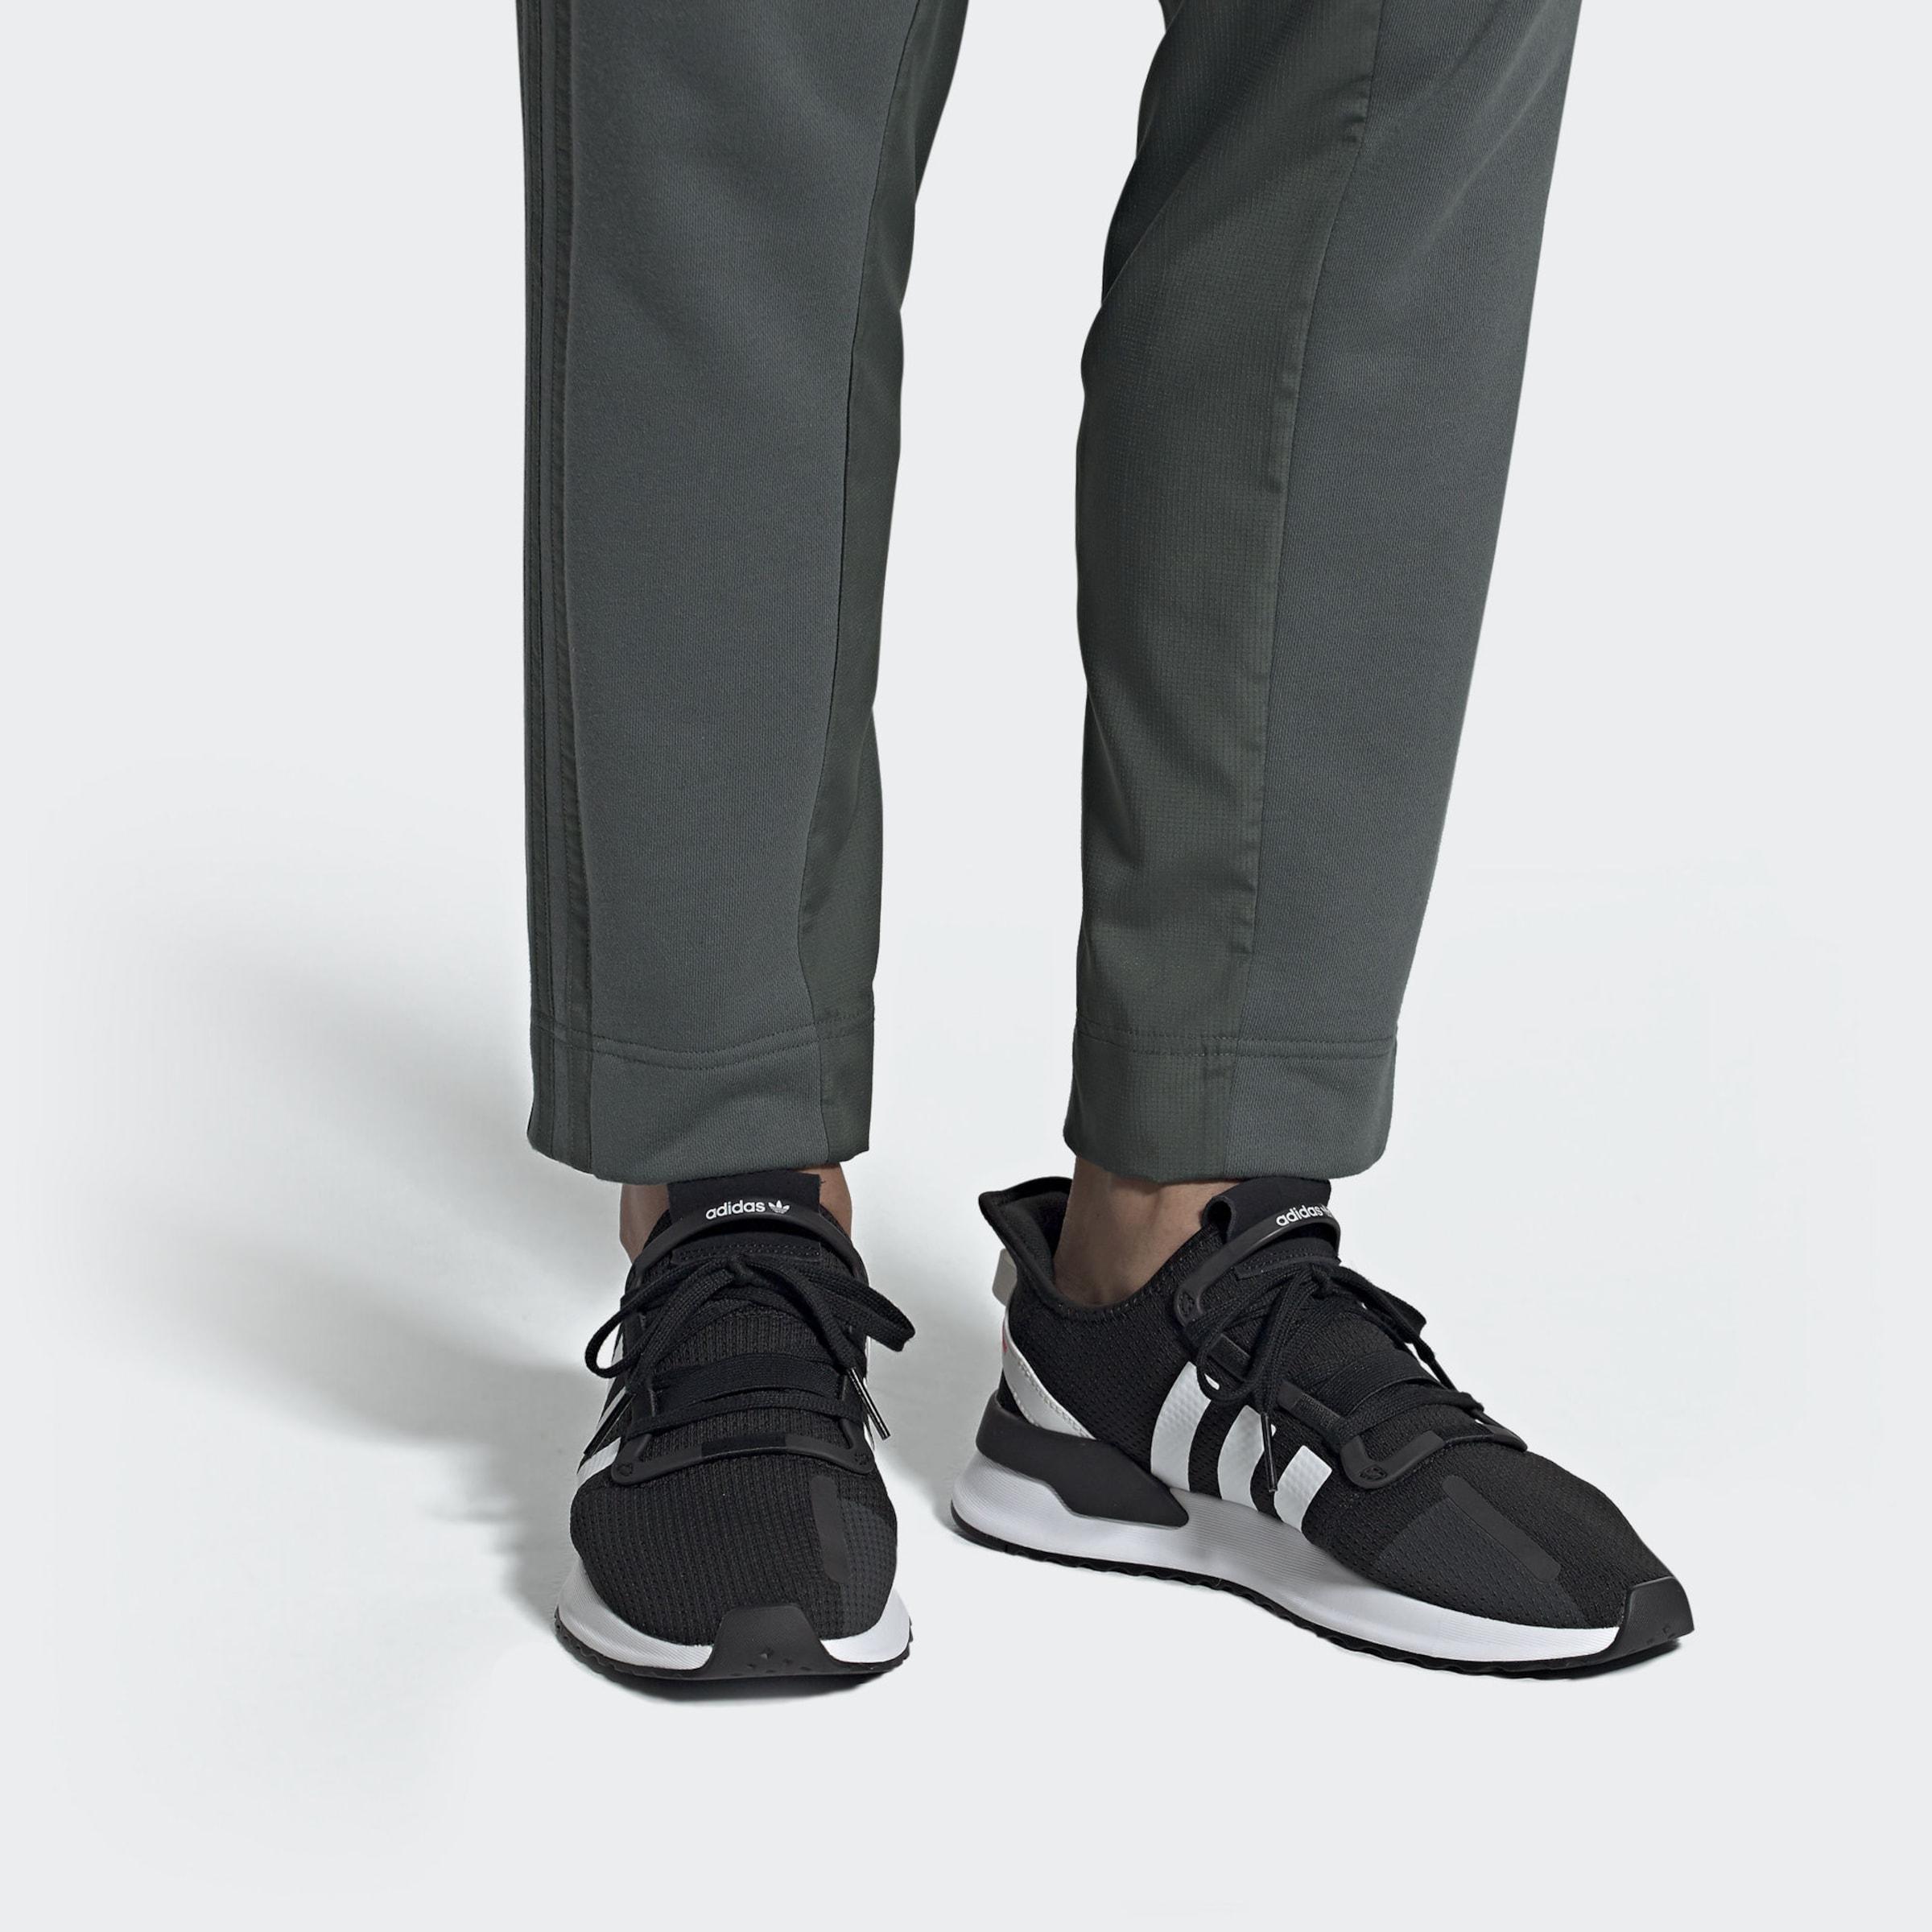 En path NoirBlanc Adidas Basses 'u Baskets Run' Originals N0X8wOnPk